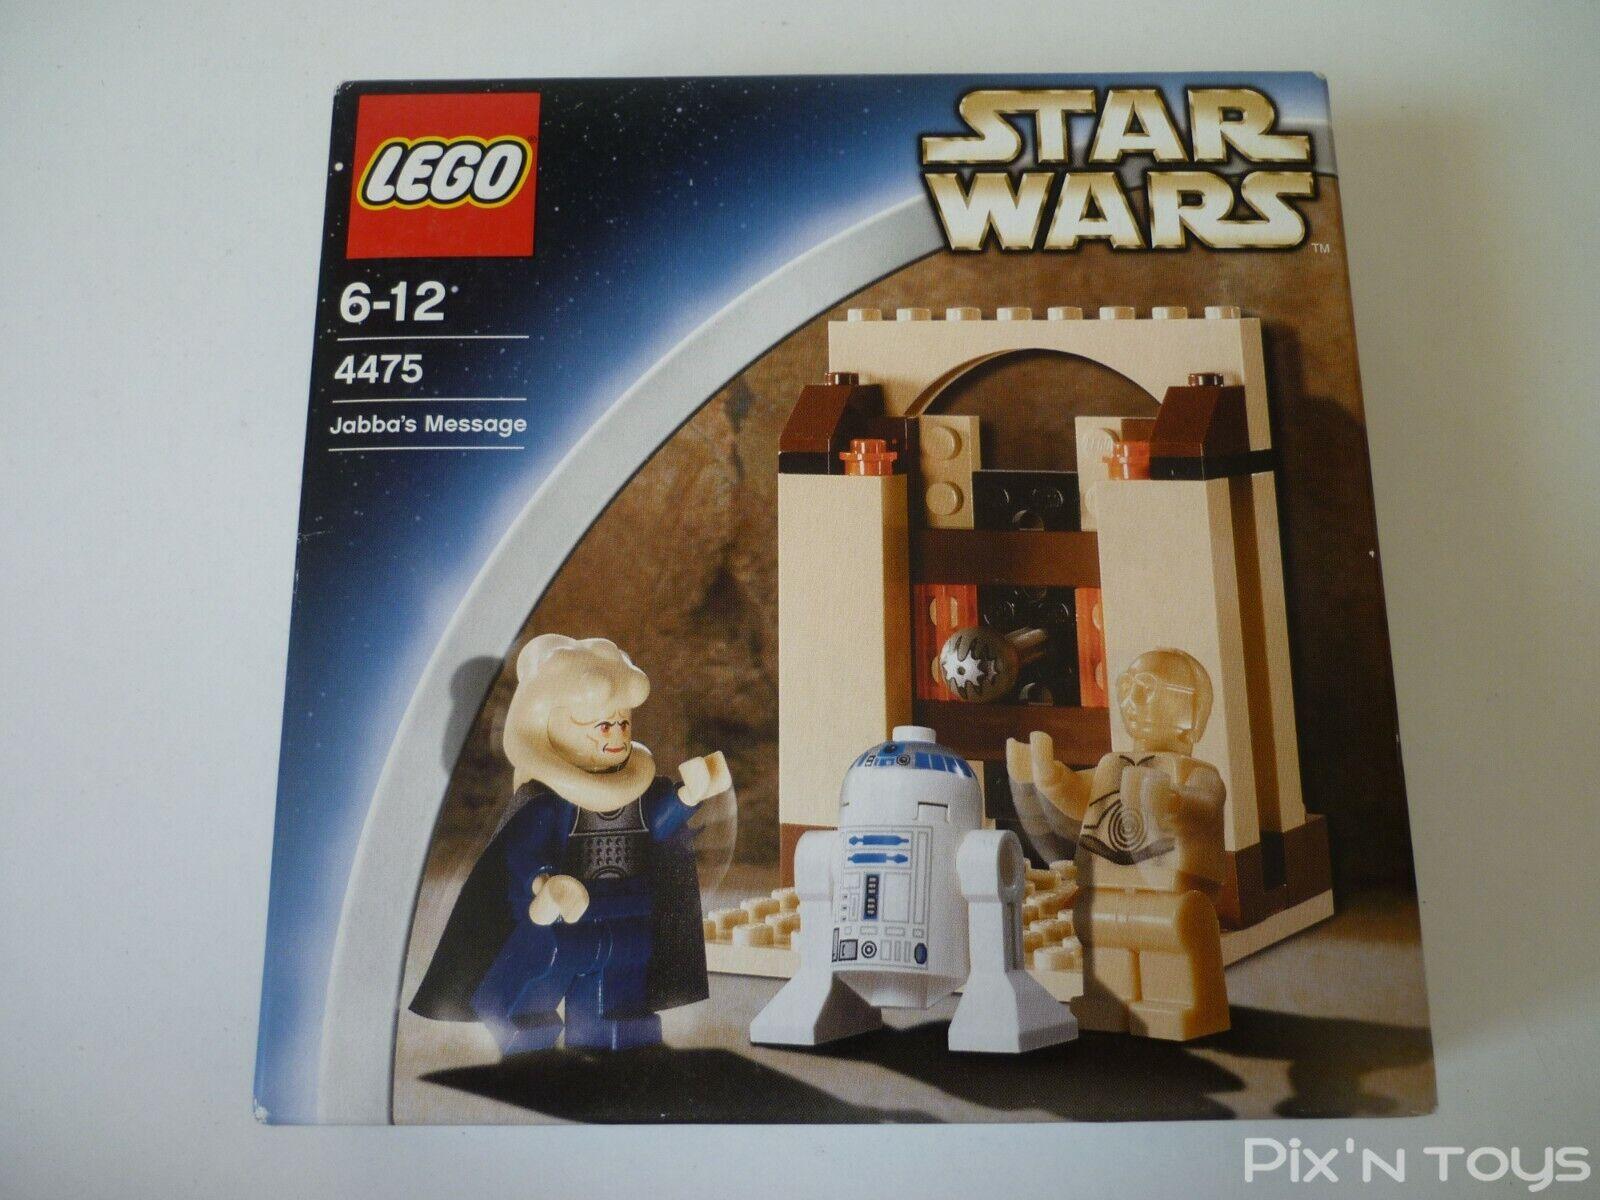 Lego Stern Wars 4475 Jabba's Message